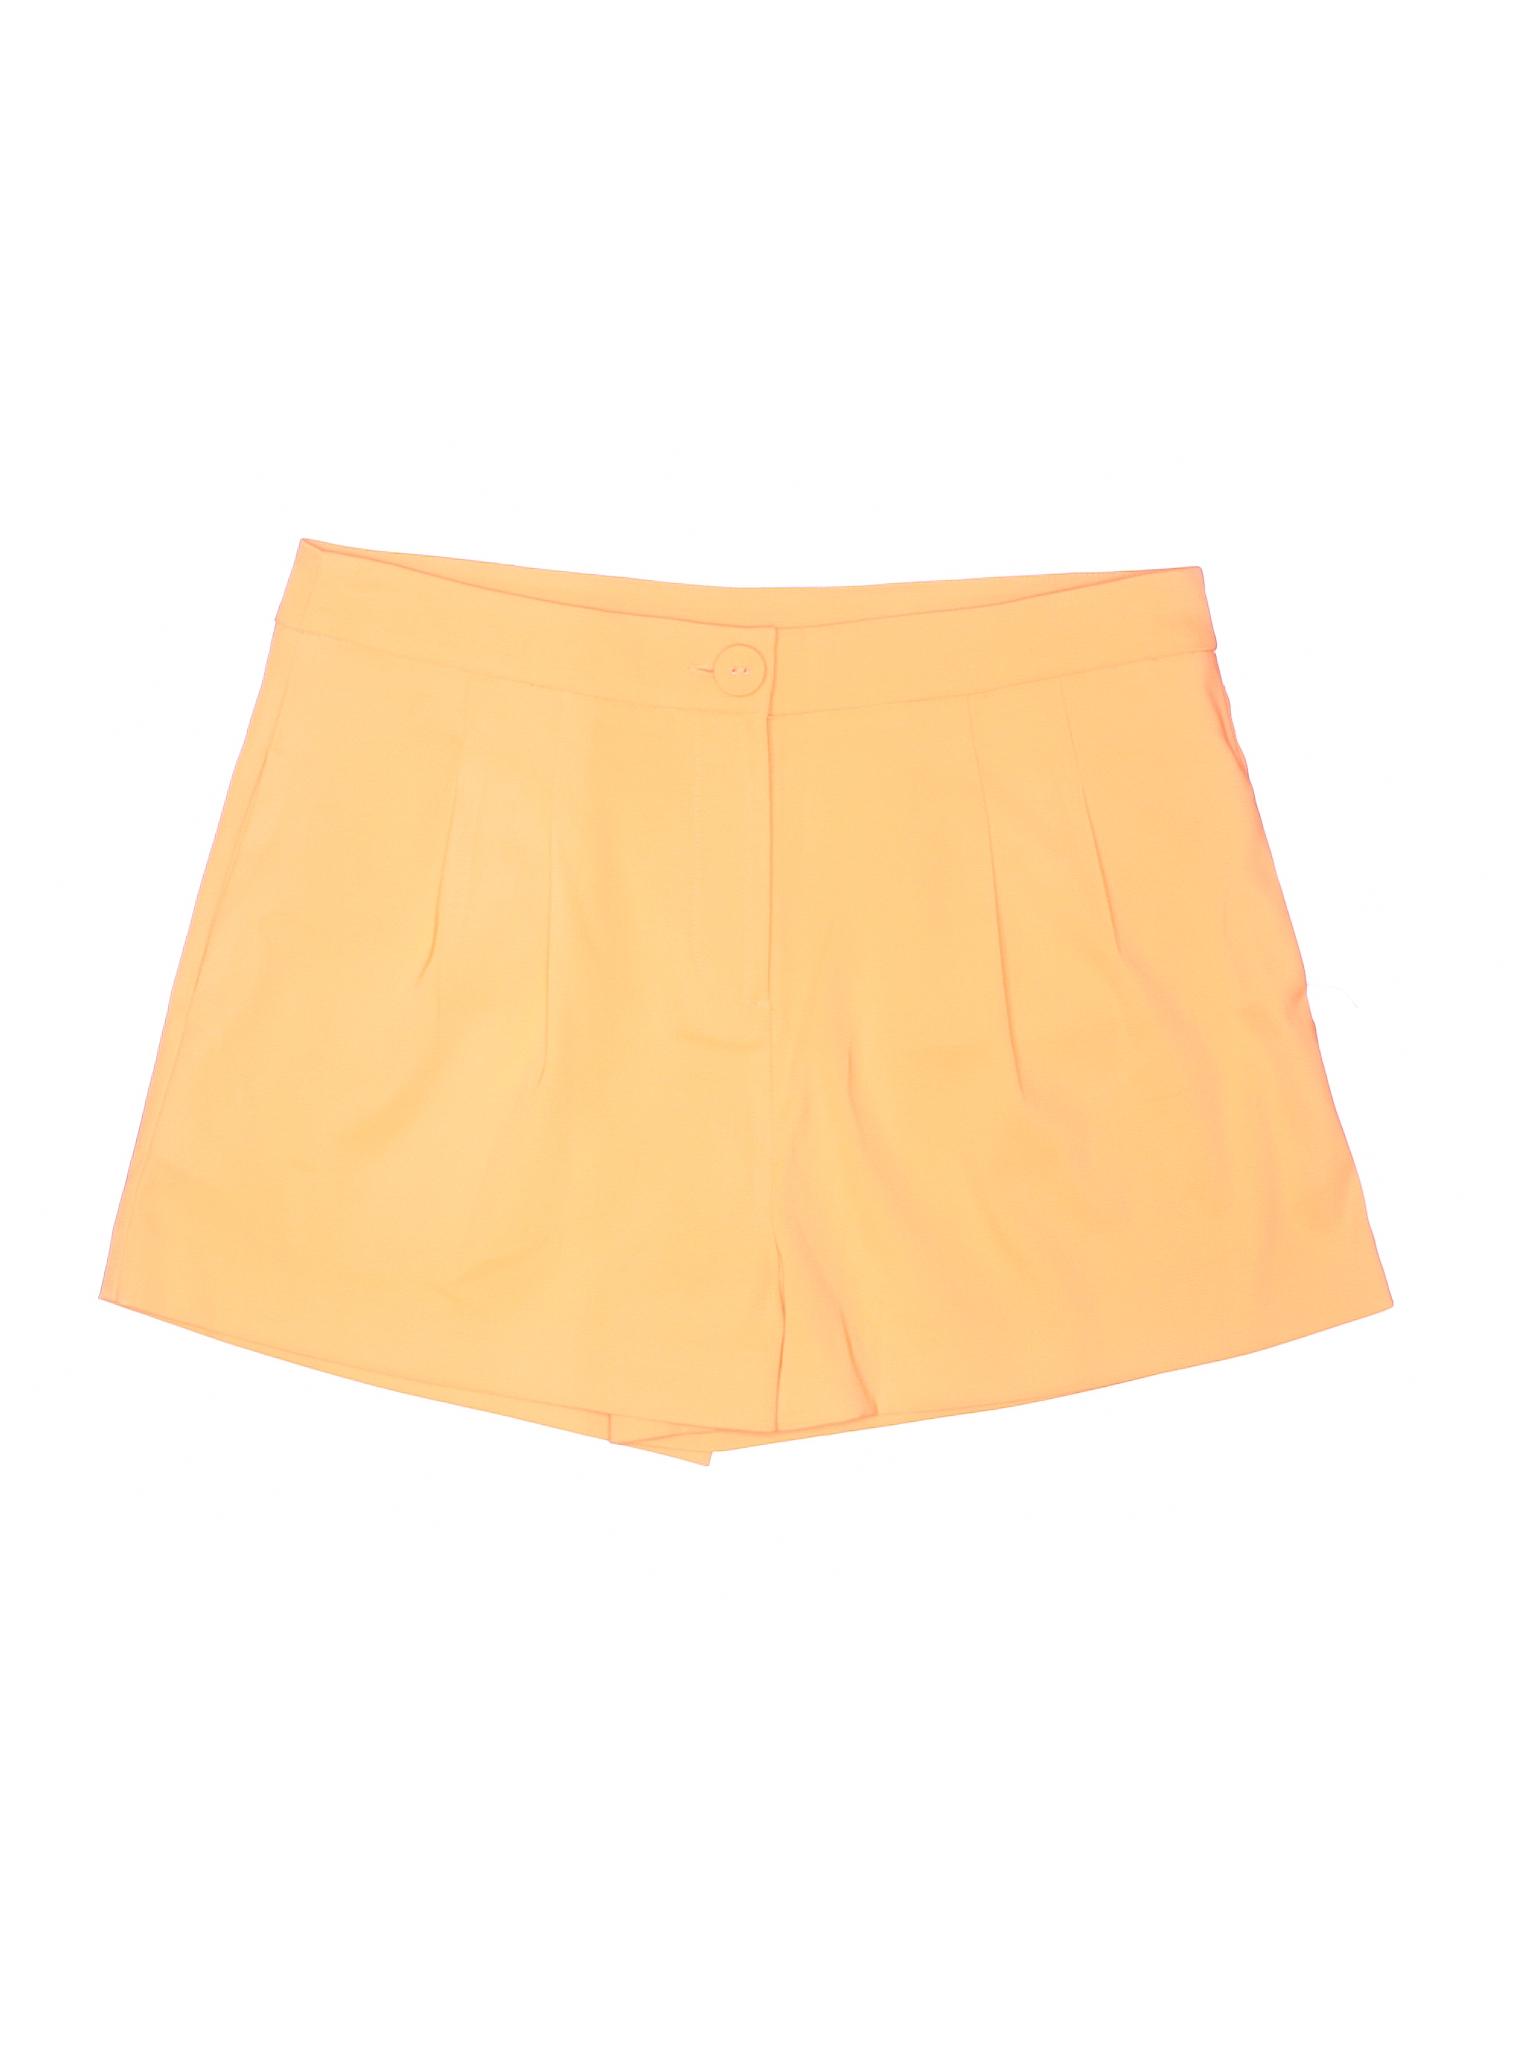 21 Forever Boutique Shorts Shorts Boutique Boutique Forever 21 1Y5pSqwE